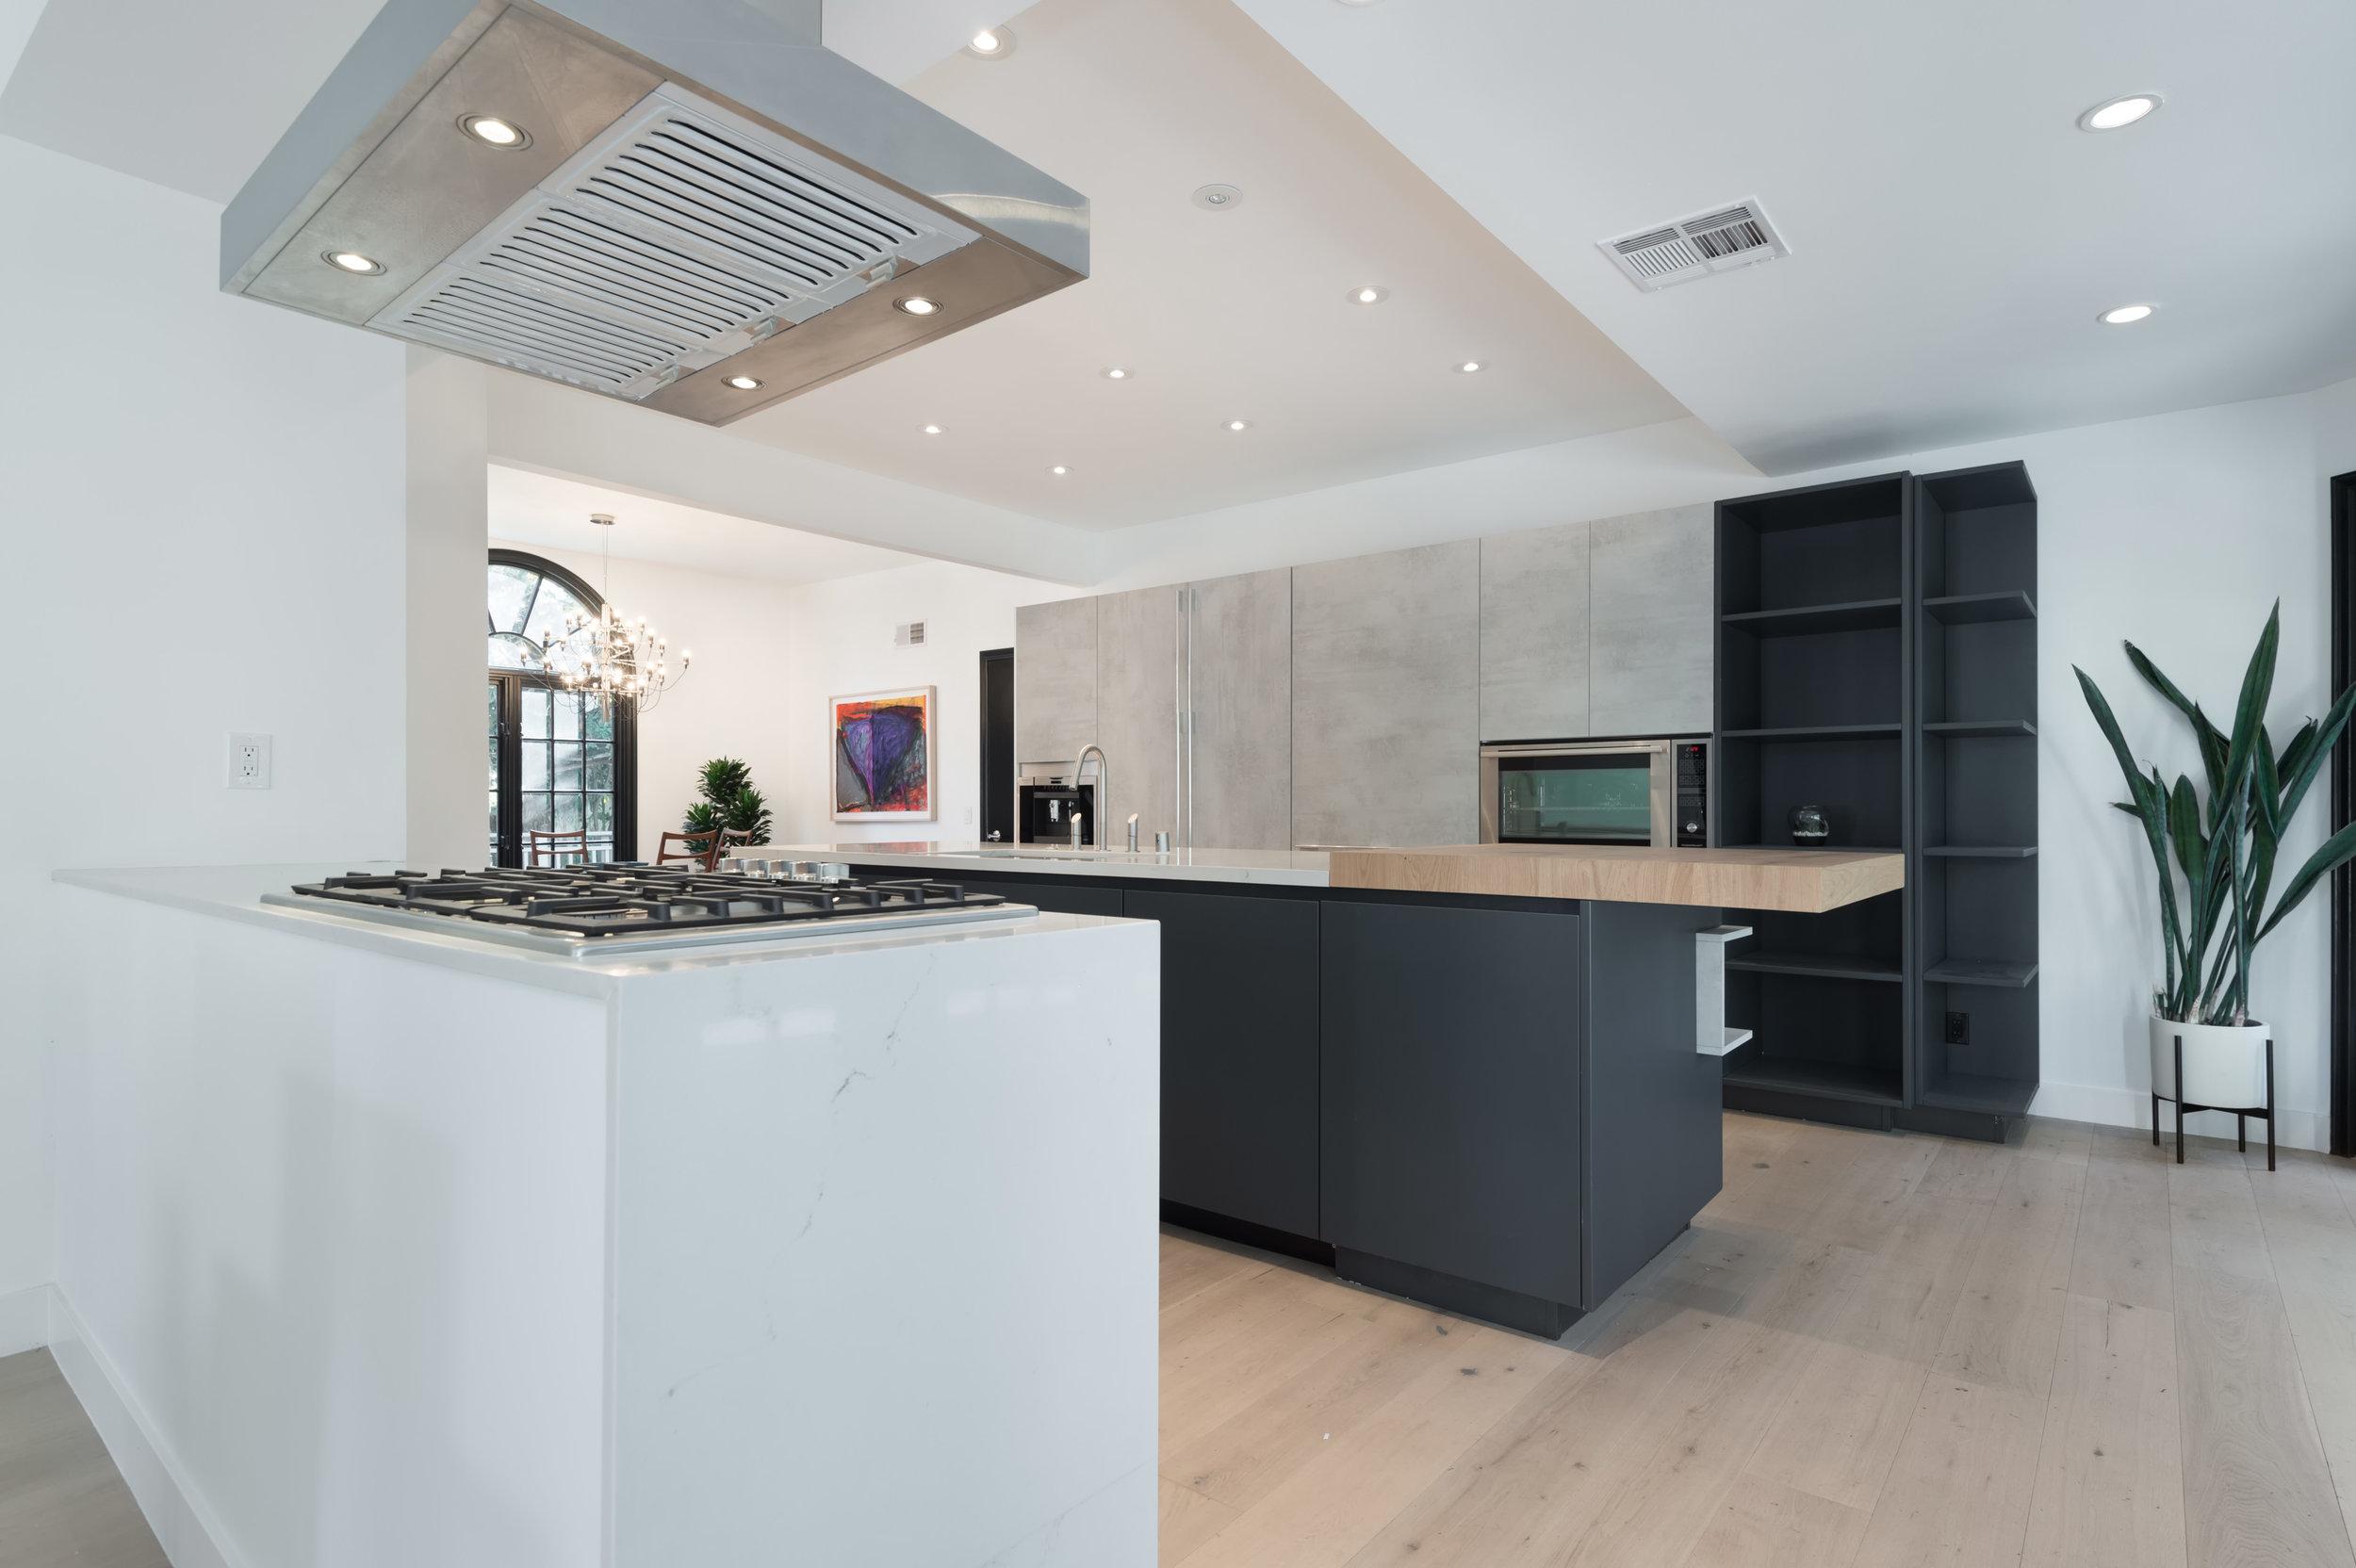 011 kitchen 30340 Morning View Malibu For Sale The Malibu Life Team Luxury Real Estate.jpg